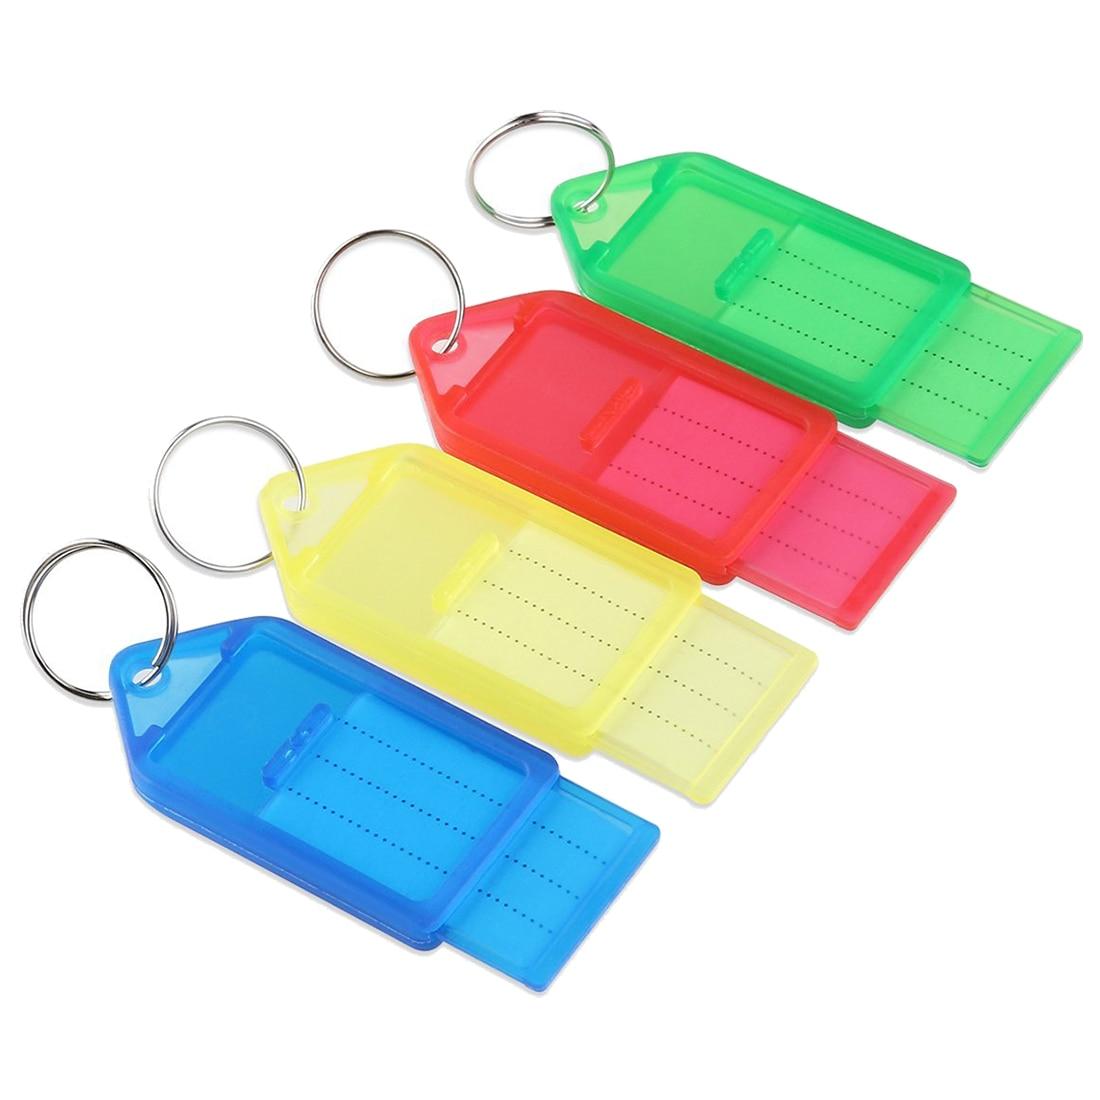 60pcs plastic Slideable Key Fobs Luggage Tags with Key Rings Random Color